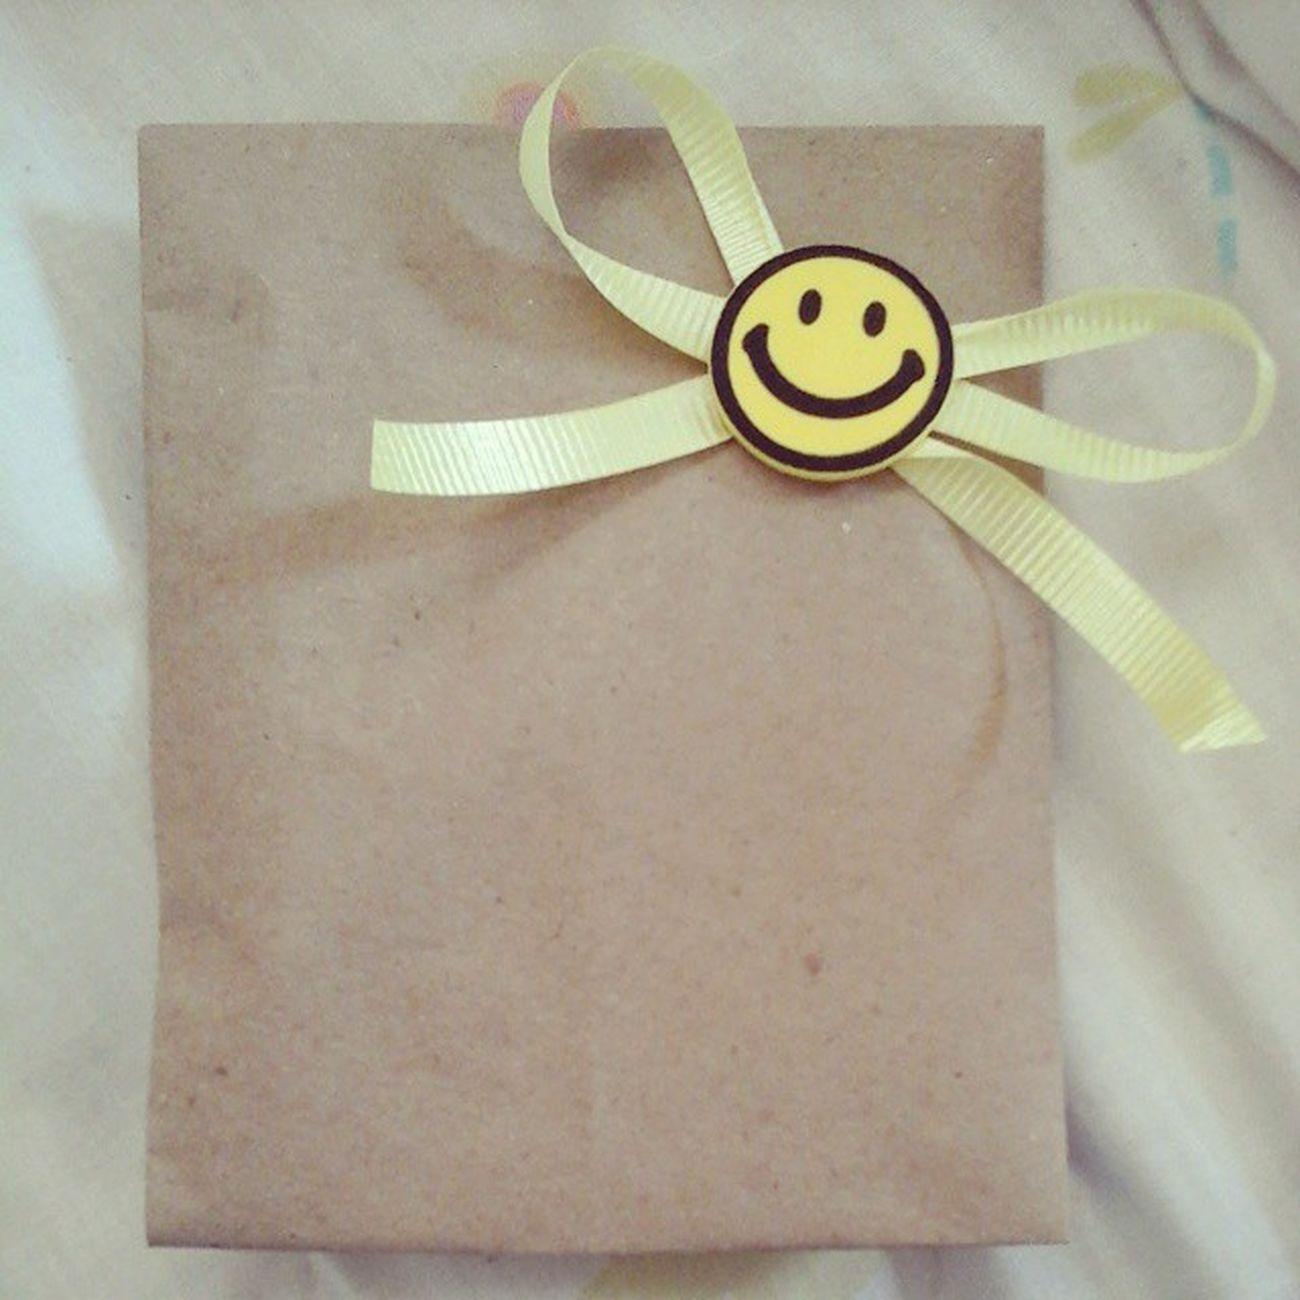 This present make me Smile R5familychile R5smile